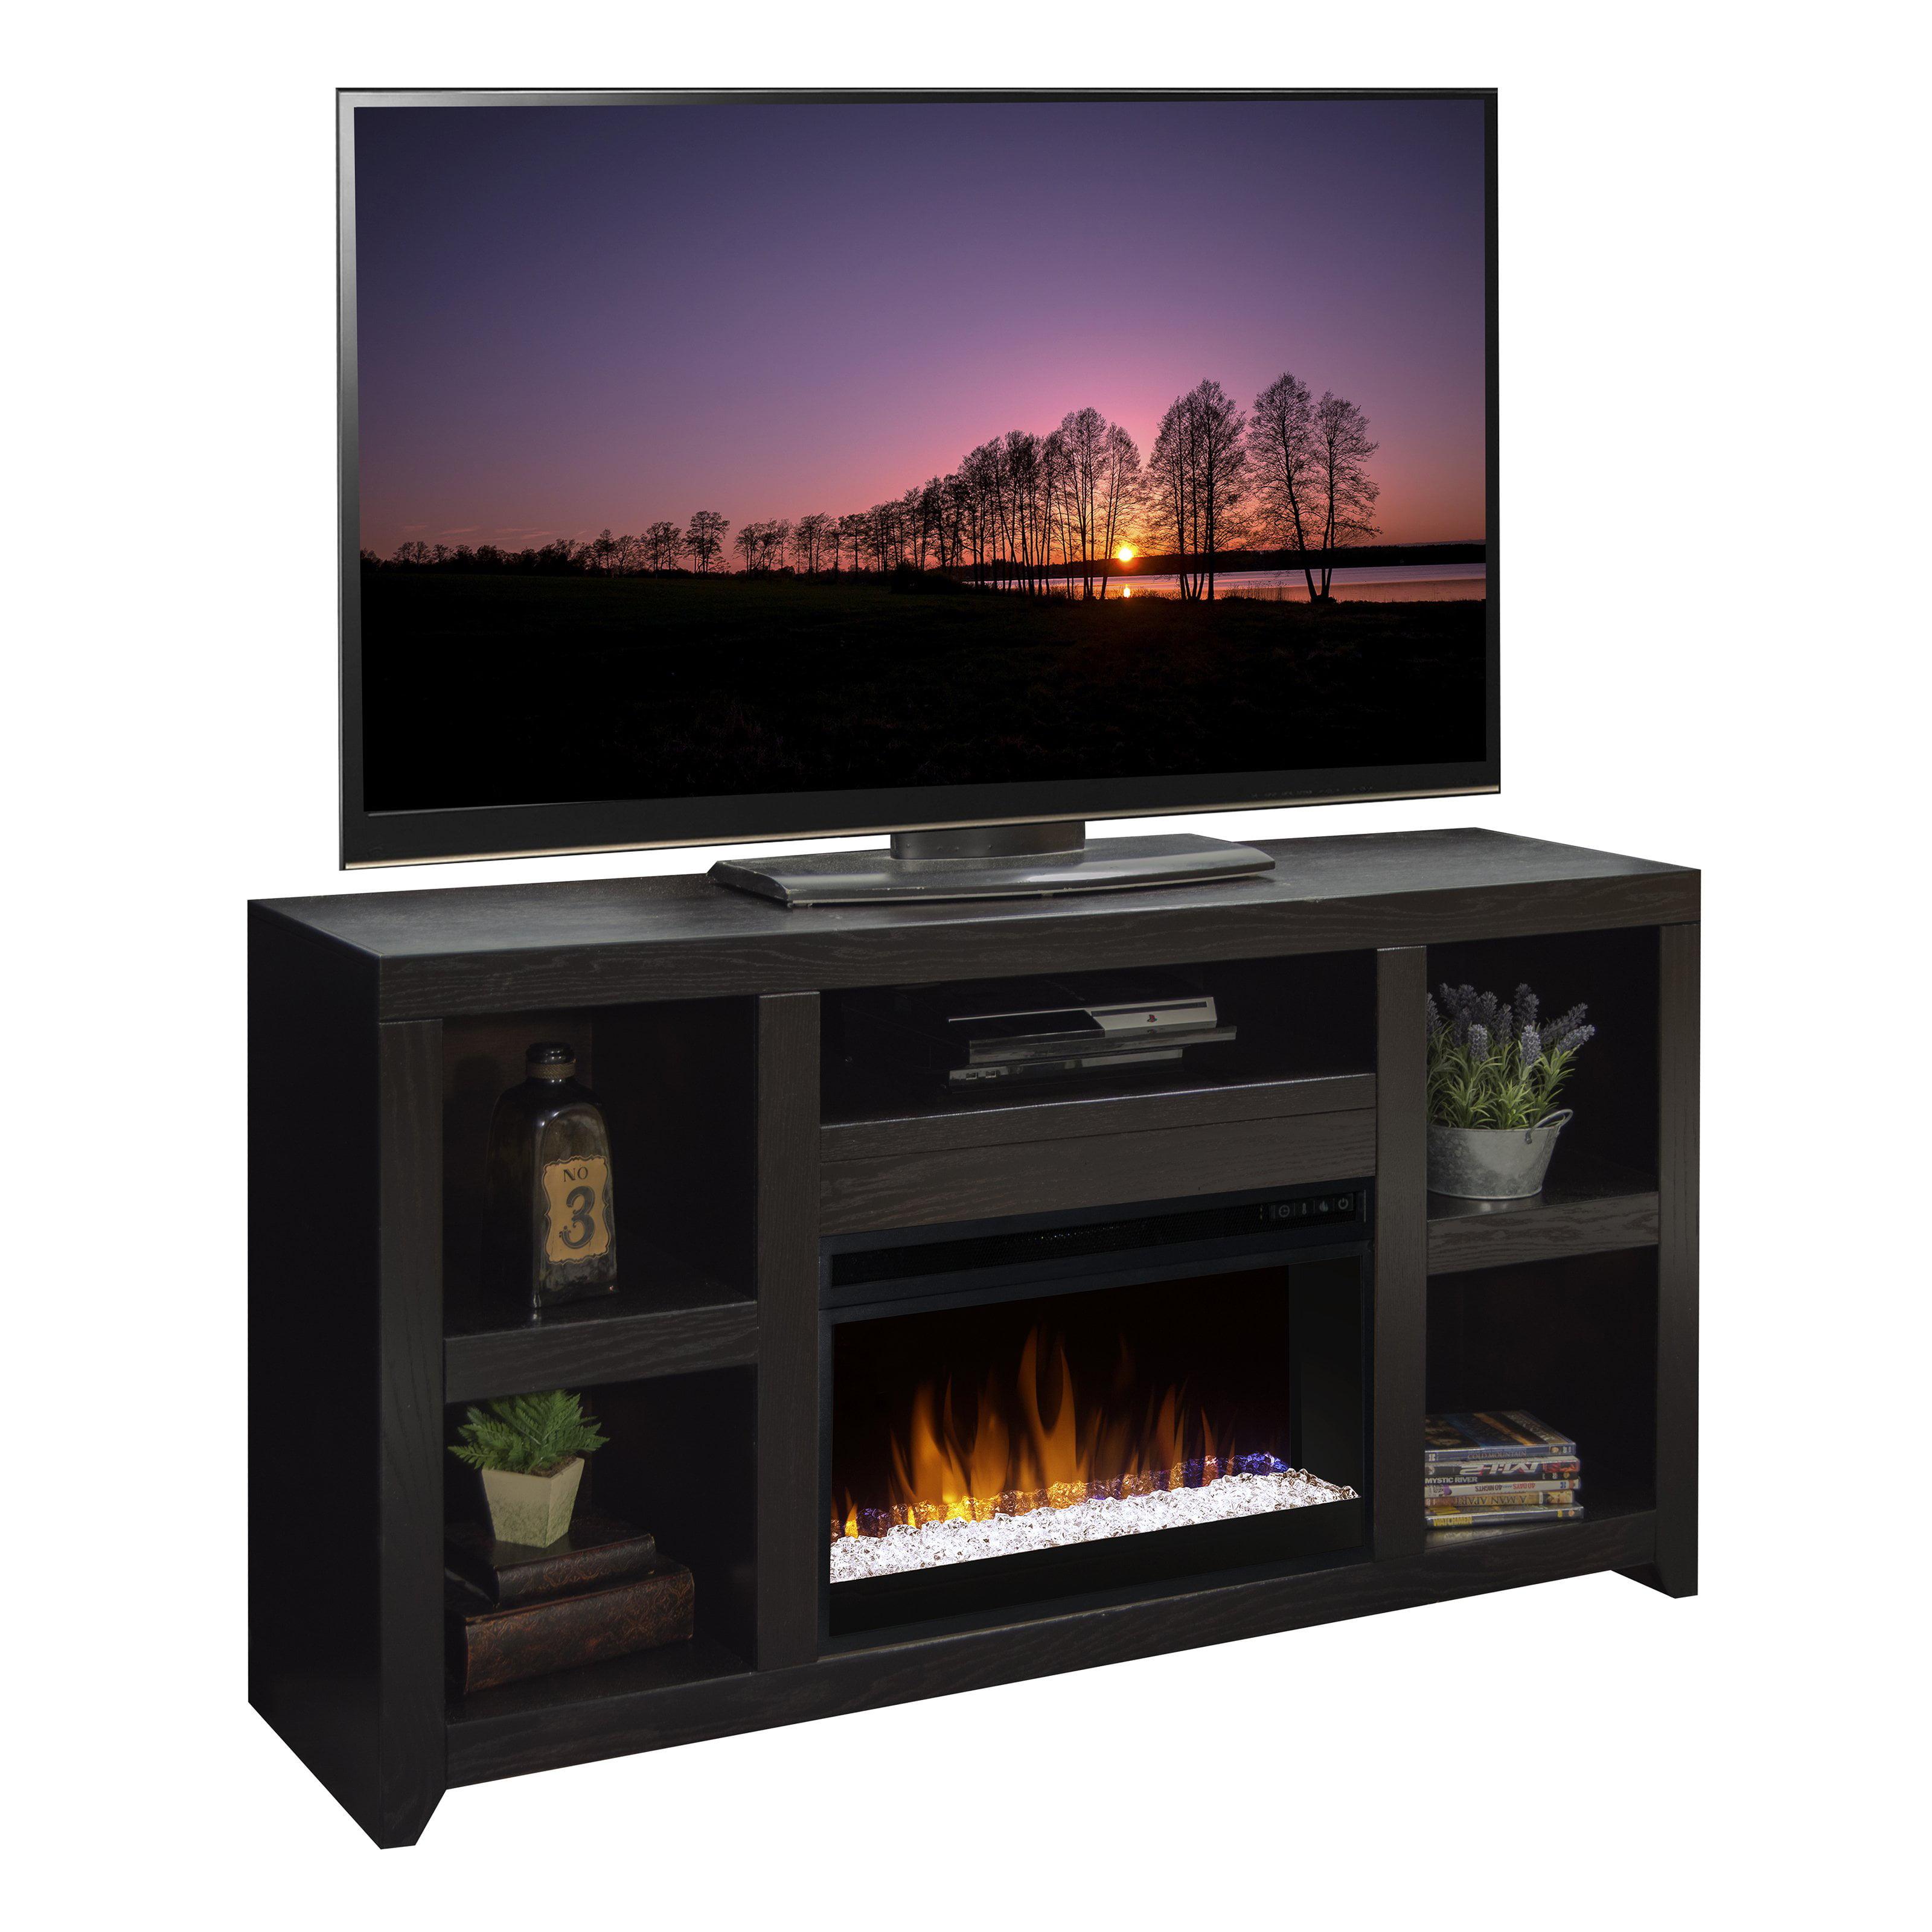 Legends Furniture Skyline 63 in. Electric Media Fireplace